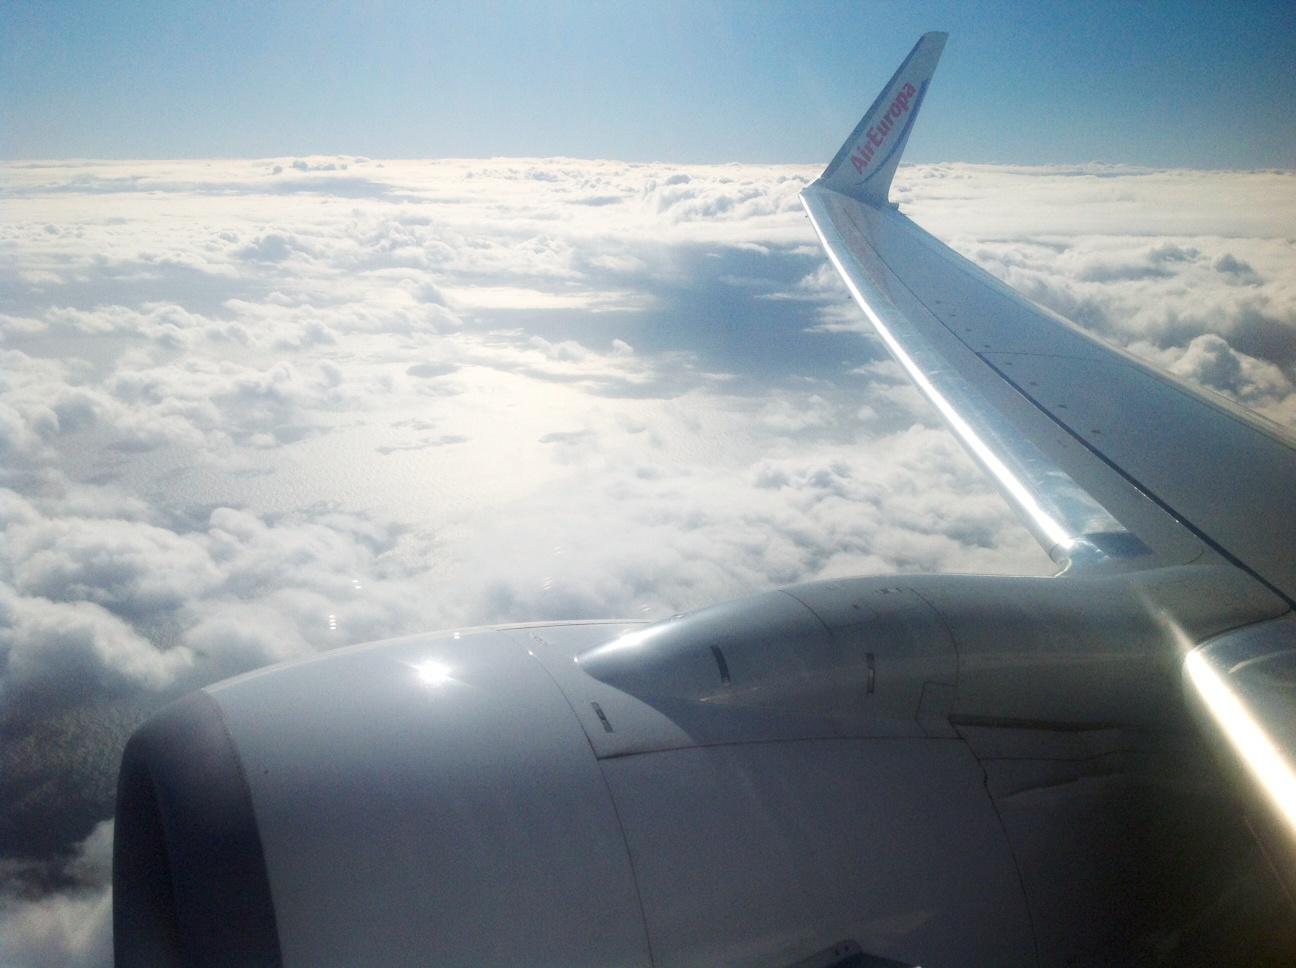 Avión de Air Europa en vuelo. Fotografía: ATCpress